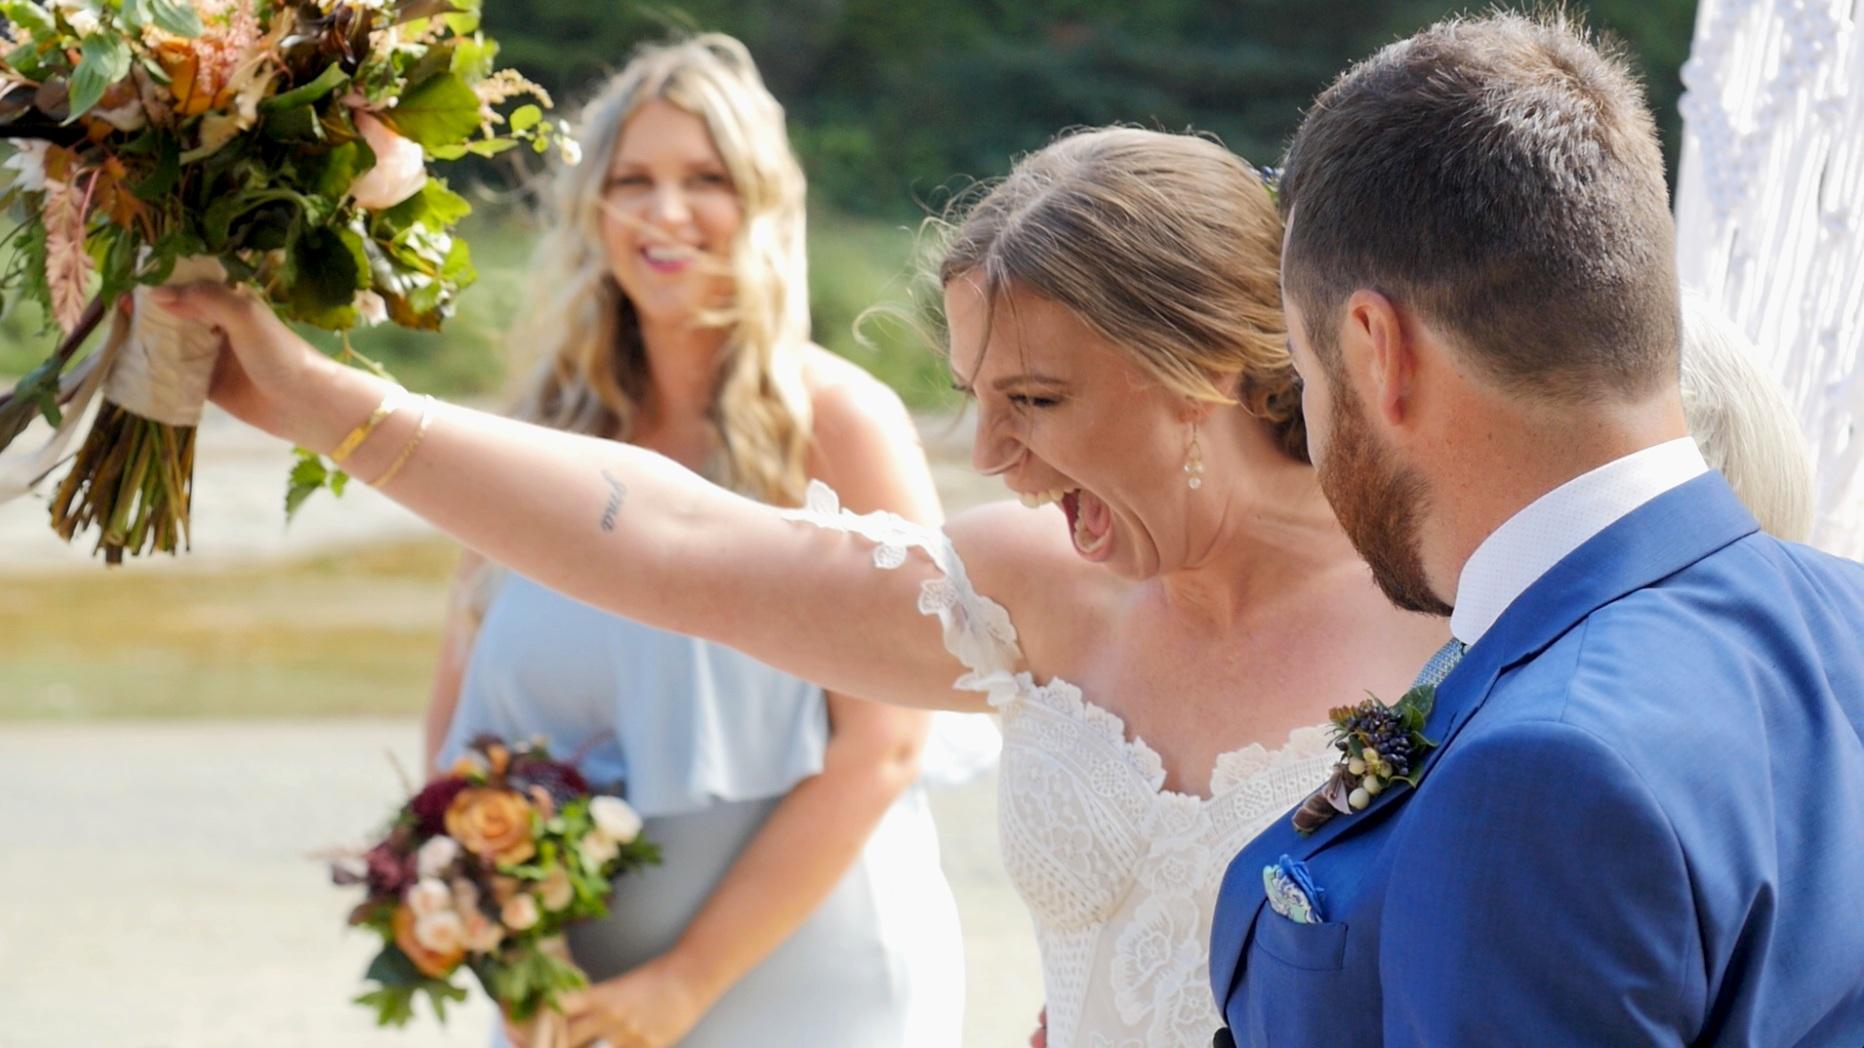 married+at+mckenzie+beach+tofino+robyn+and+ben.jpg